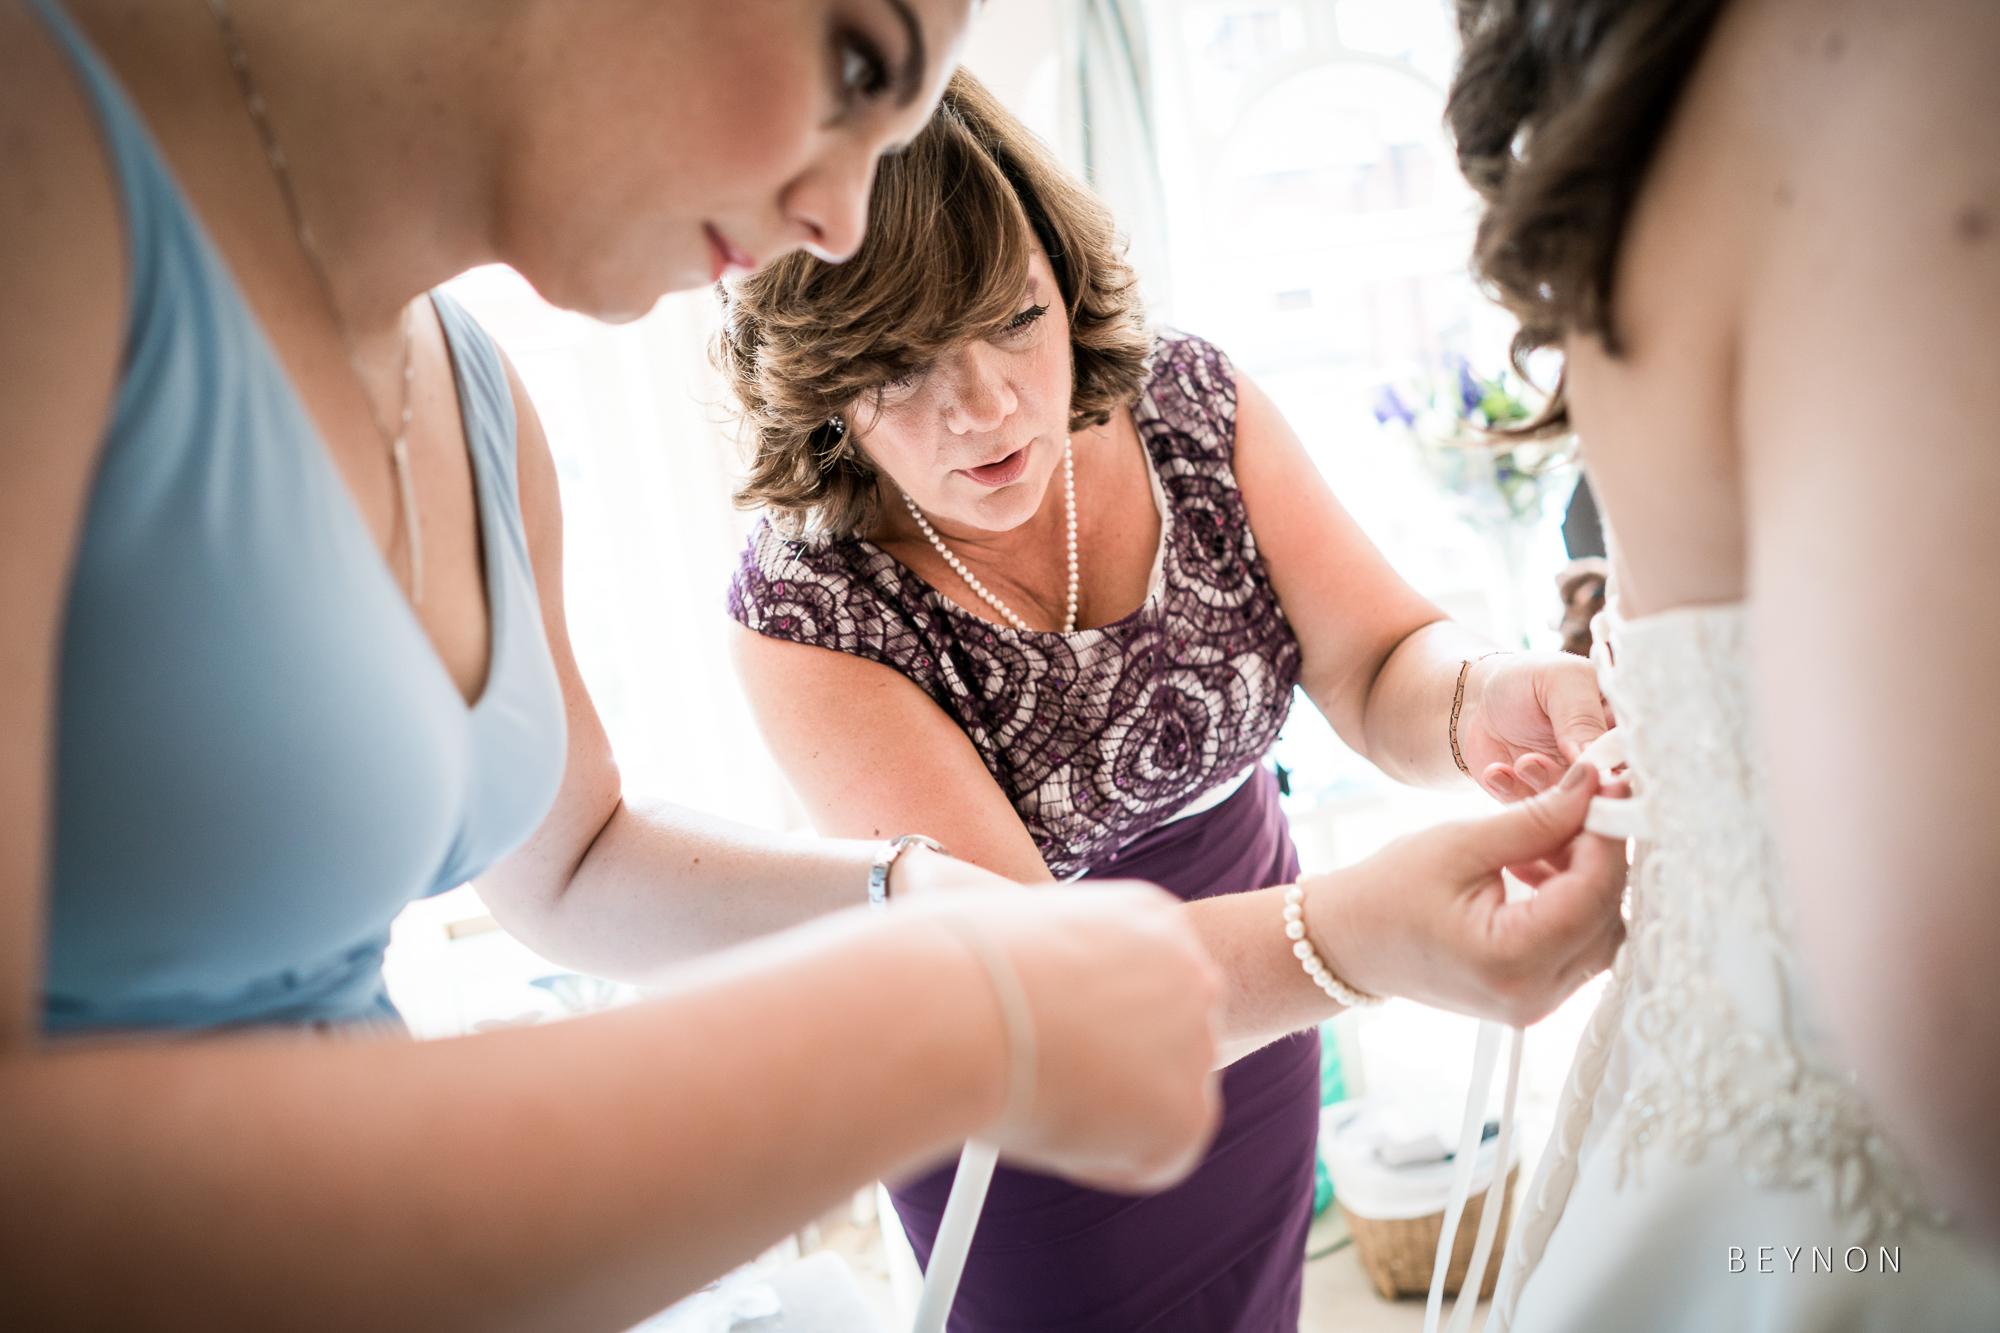 Mum does up wedding dress